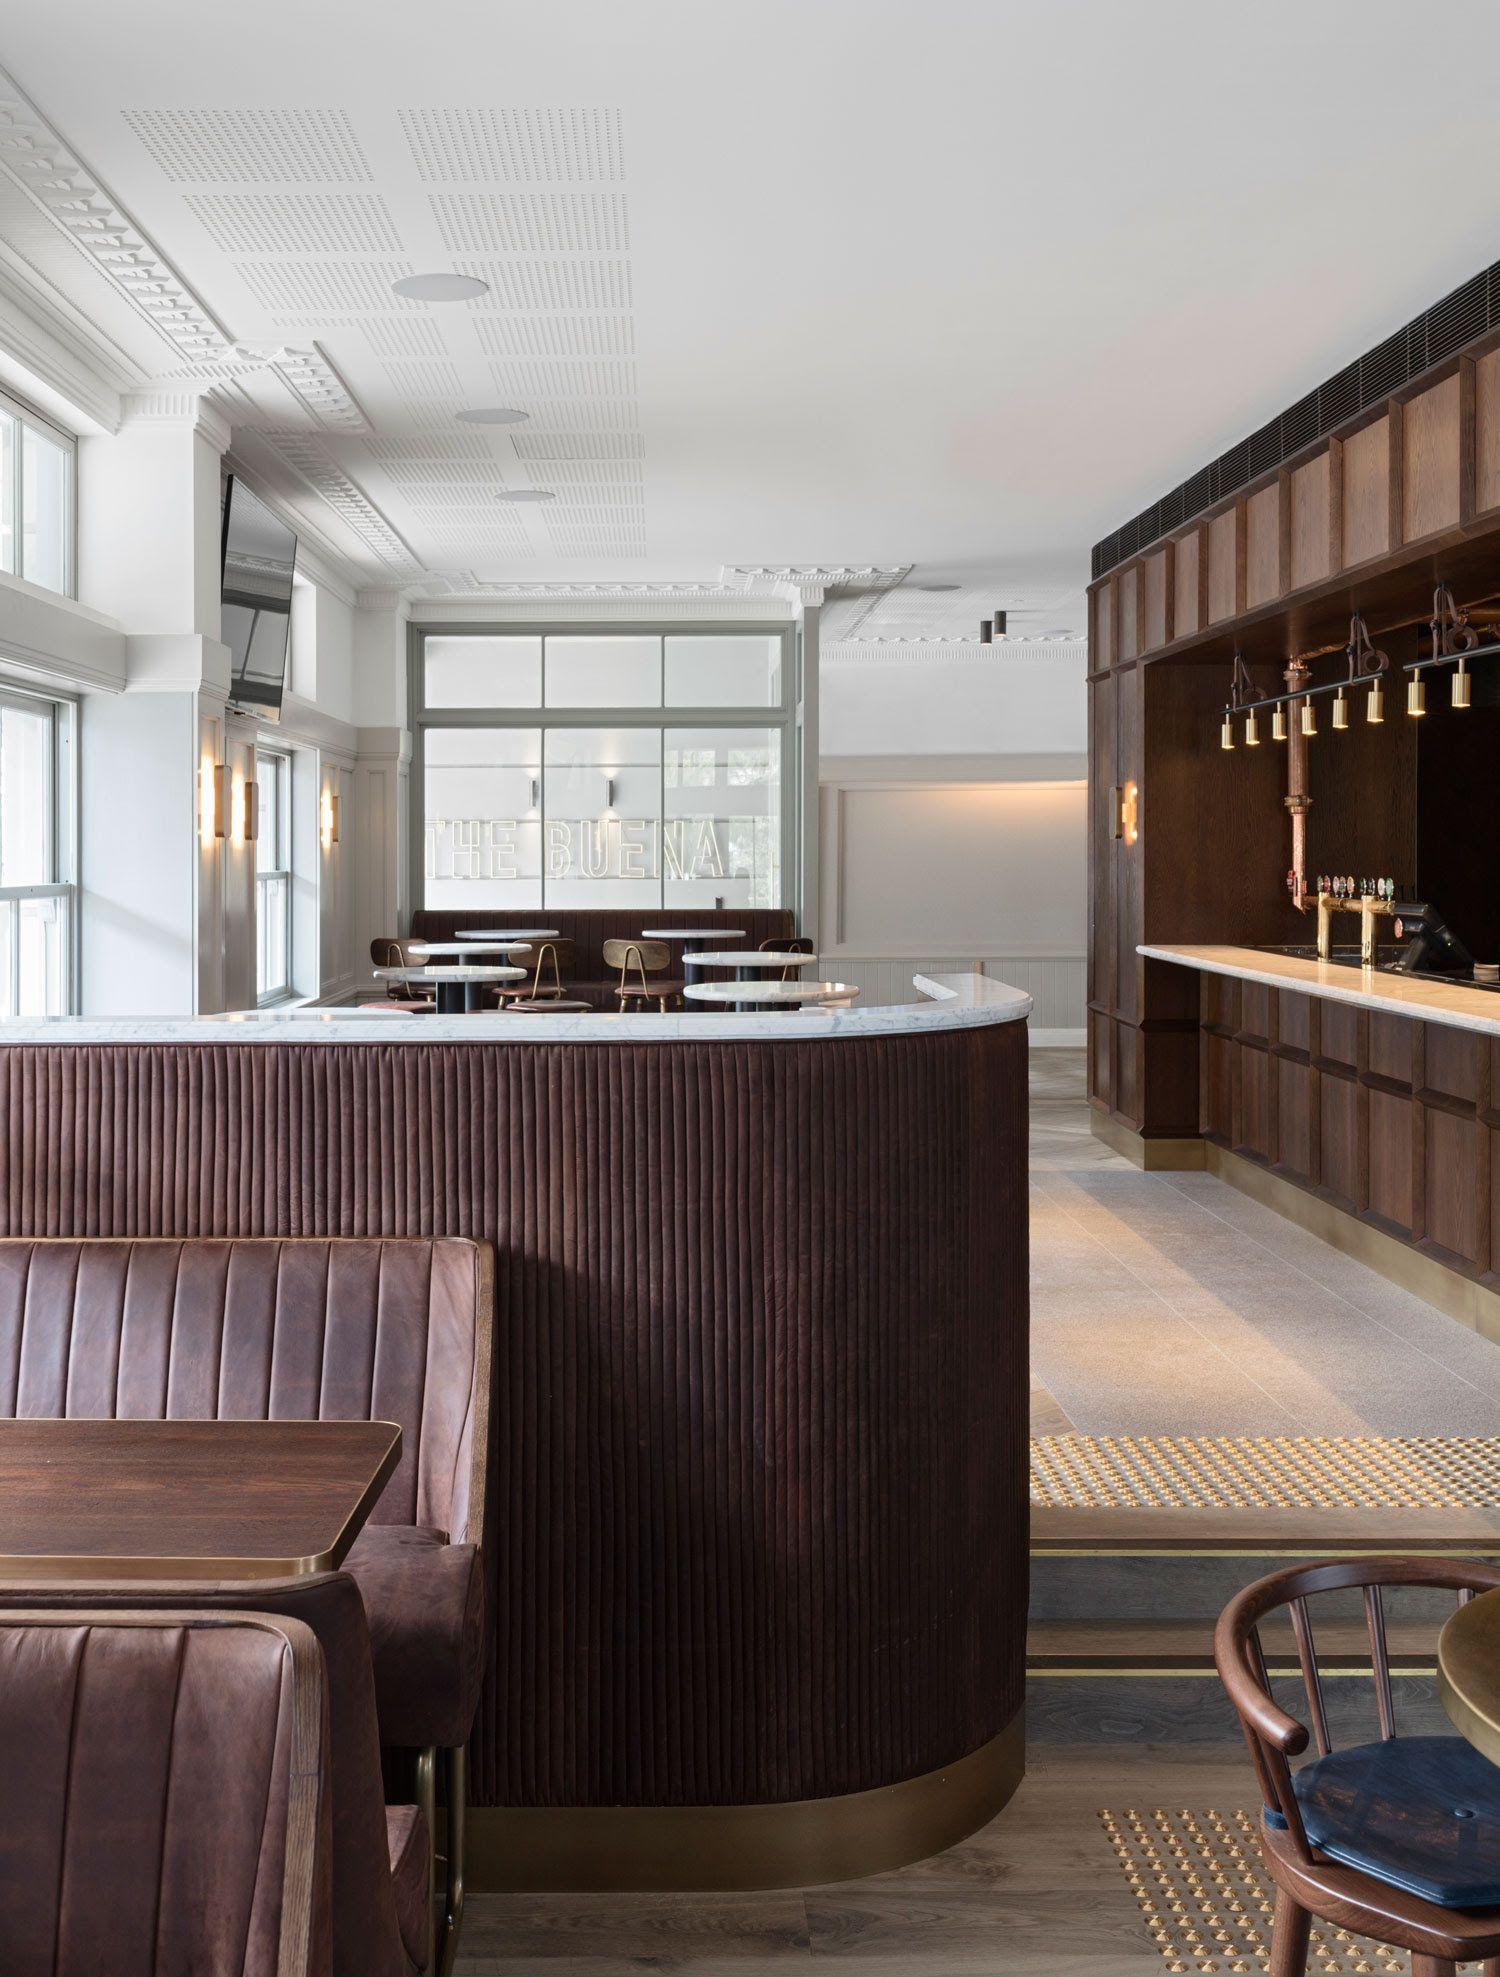 Buena Vista Hotel In Mosman Australia By Sjb Yellowtrace